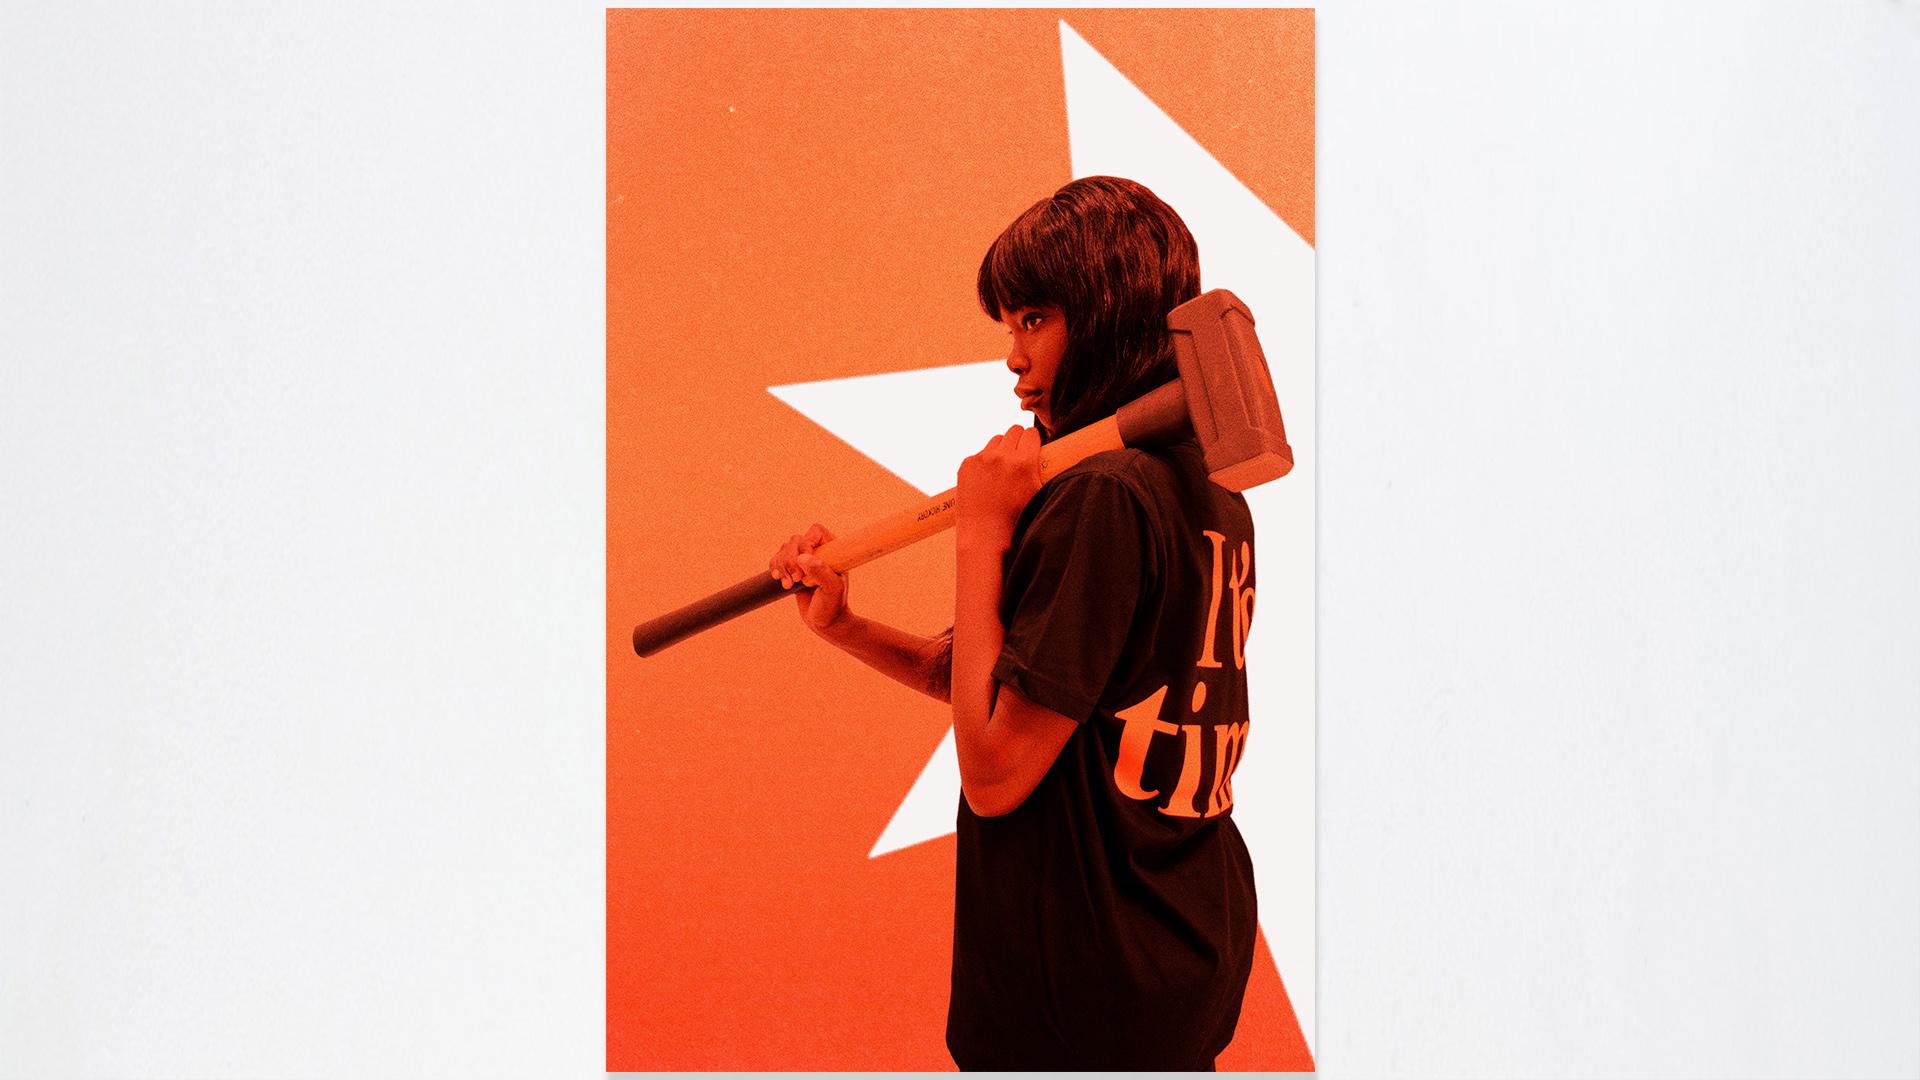 Poster 1 (Cynthia) (2019)